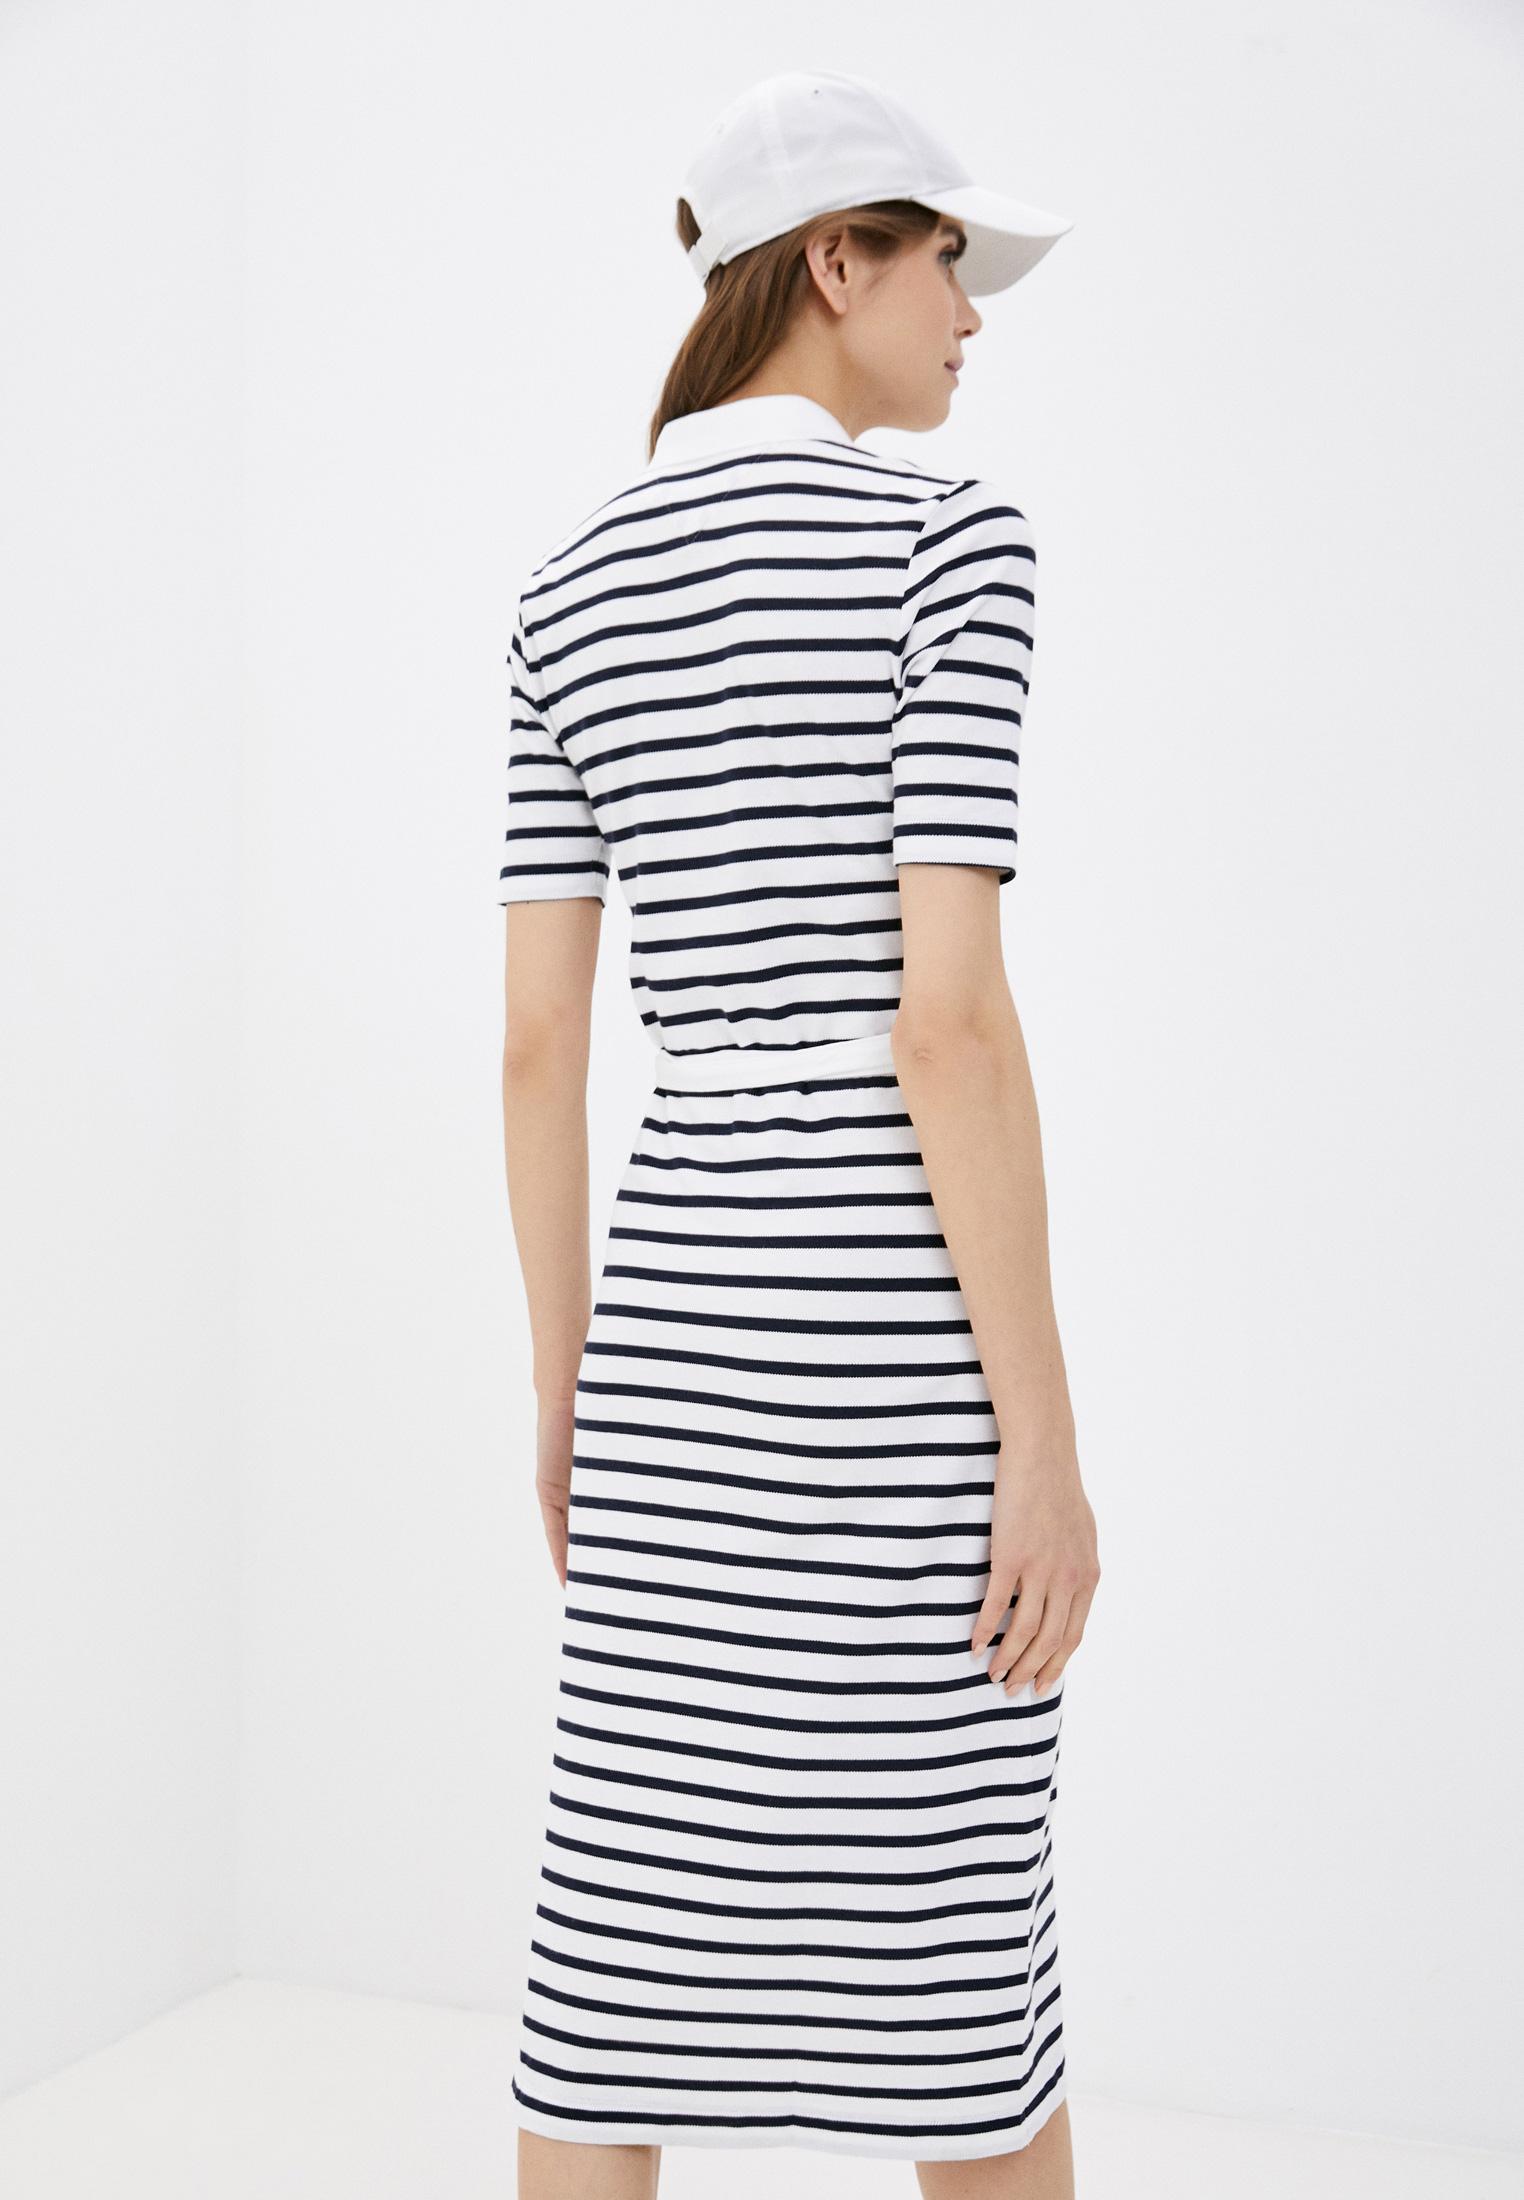 Платье Tommy Hilfiger (Томми Хилфигер) WW0WW30370: изображение 3